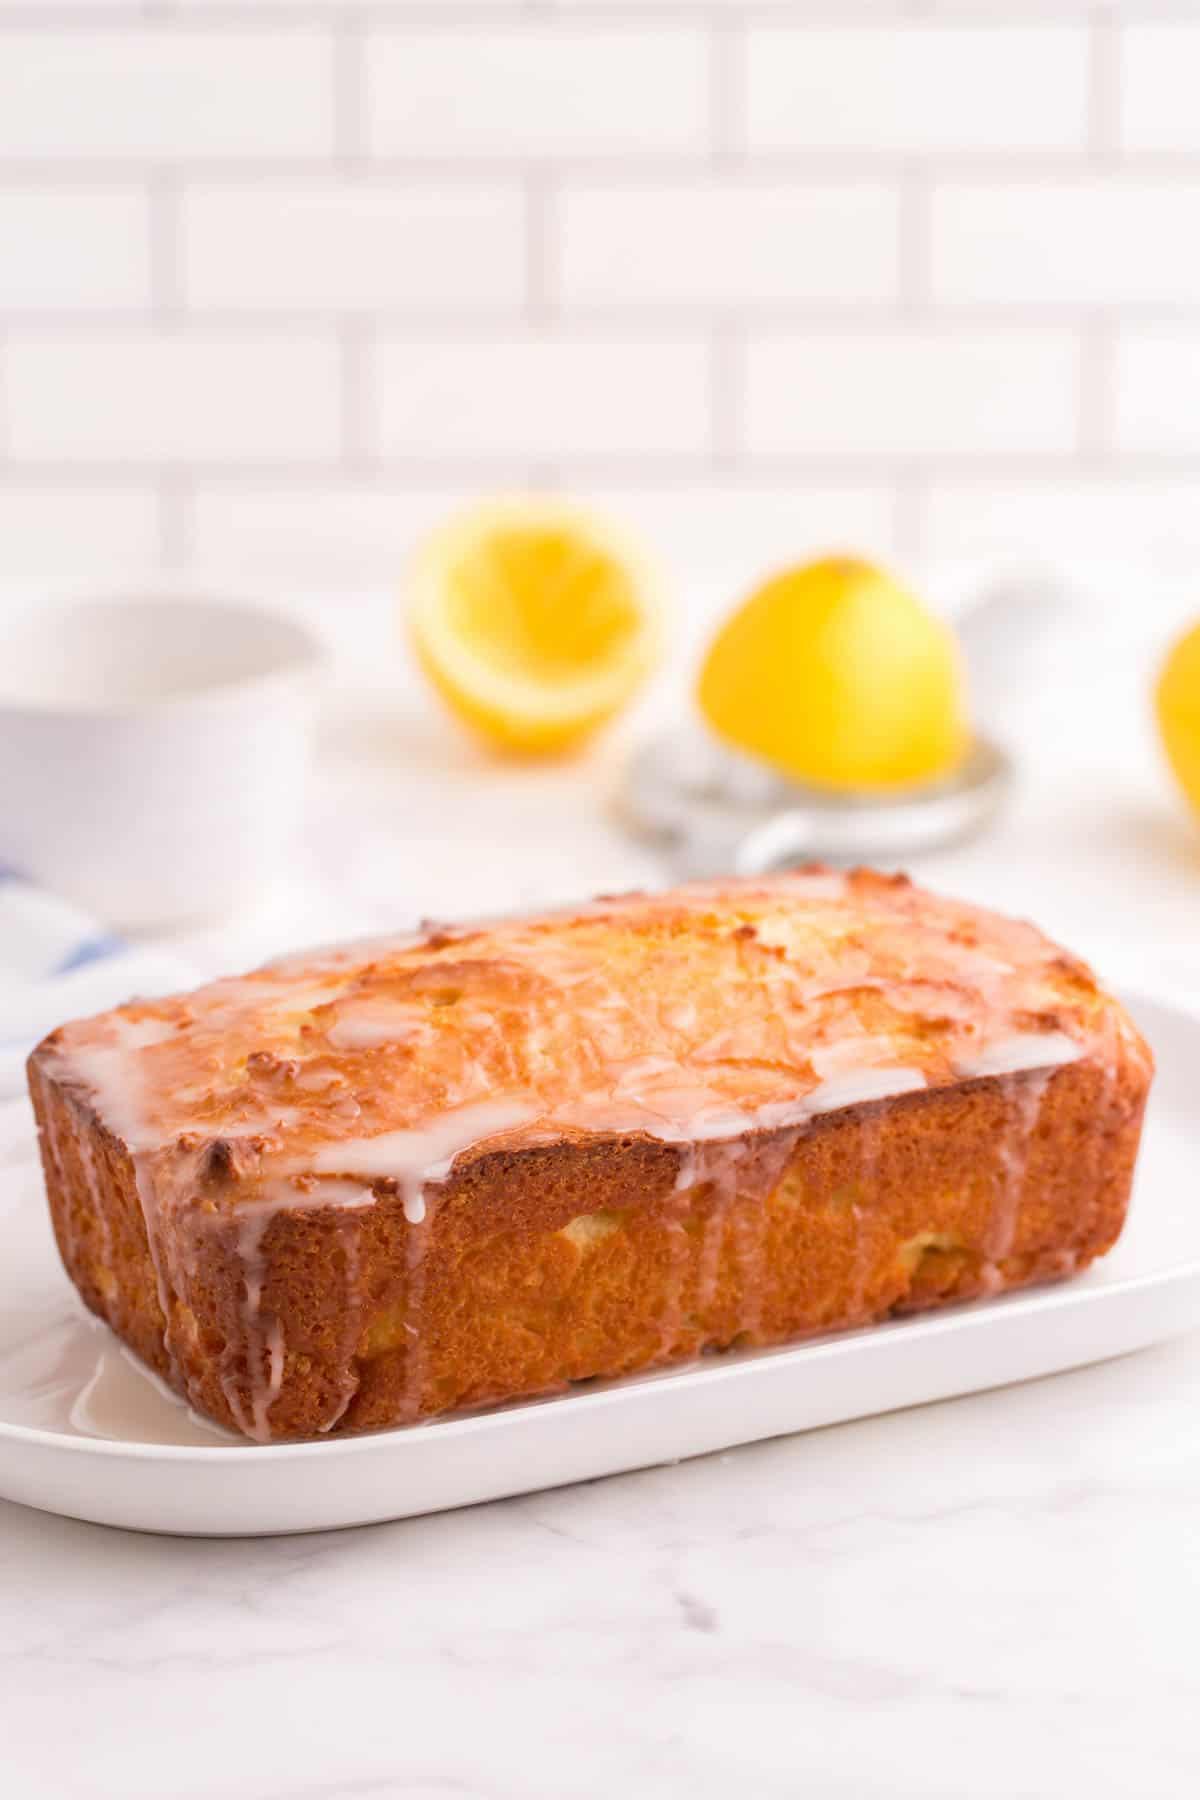 Finished glazed lemon bread on a white platter